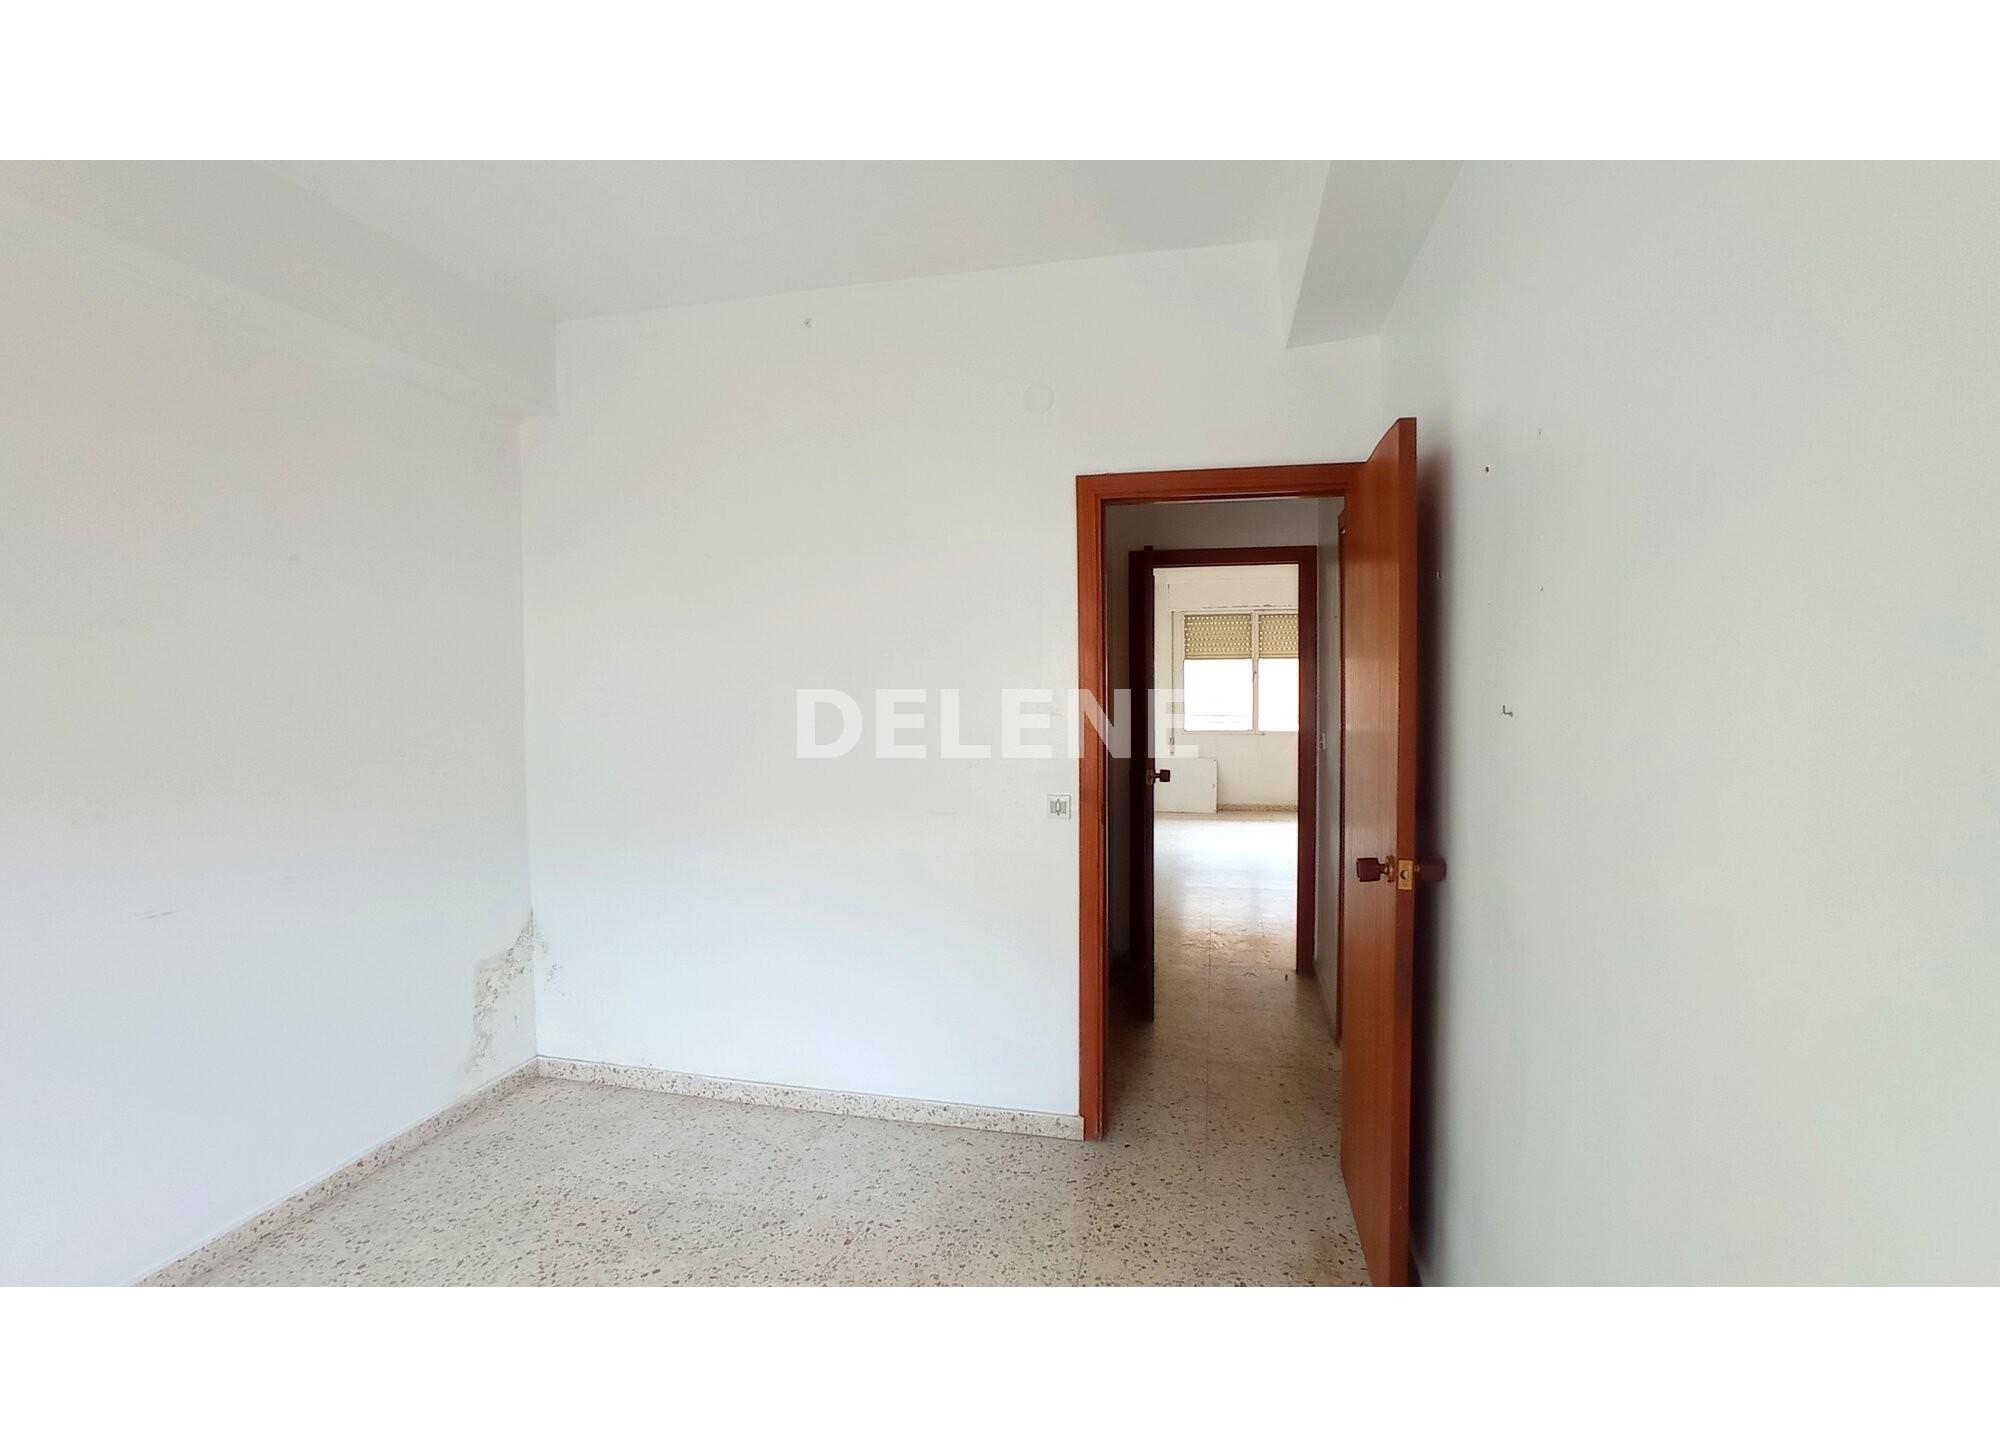 2186 PISO, ZONA HIGUERICAS